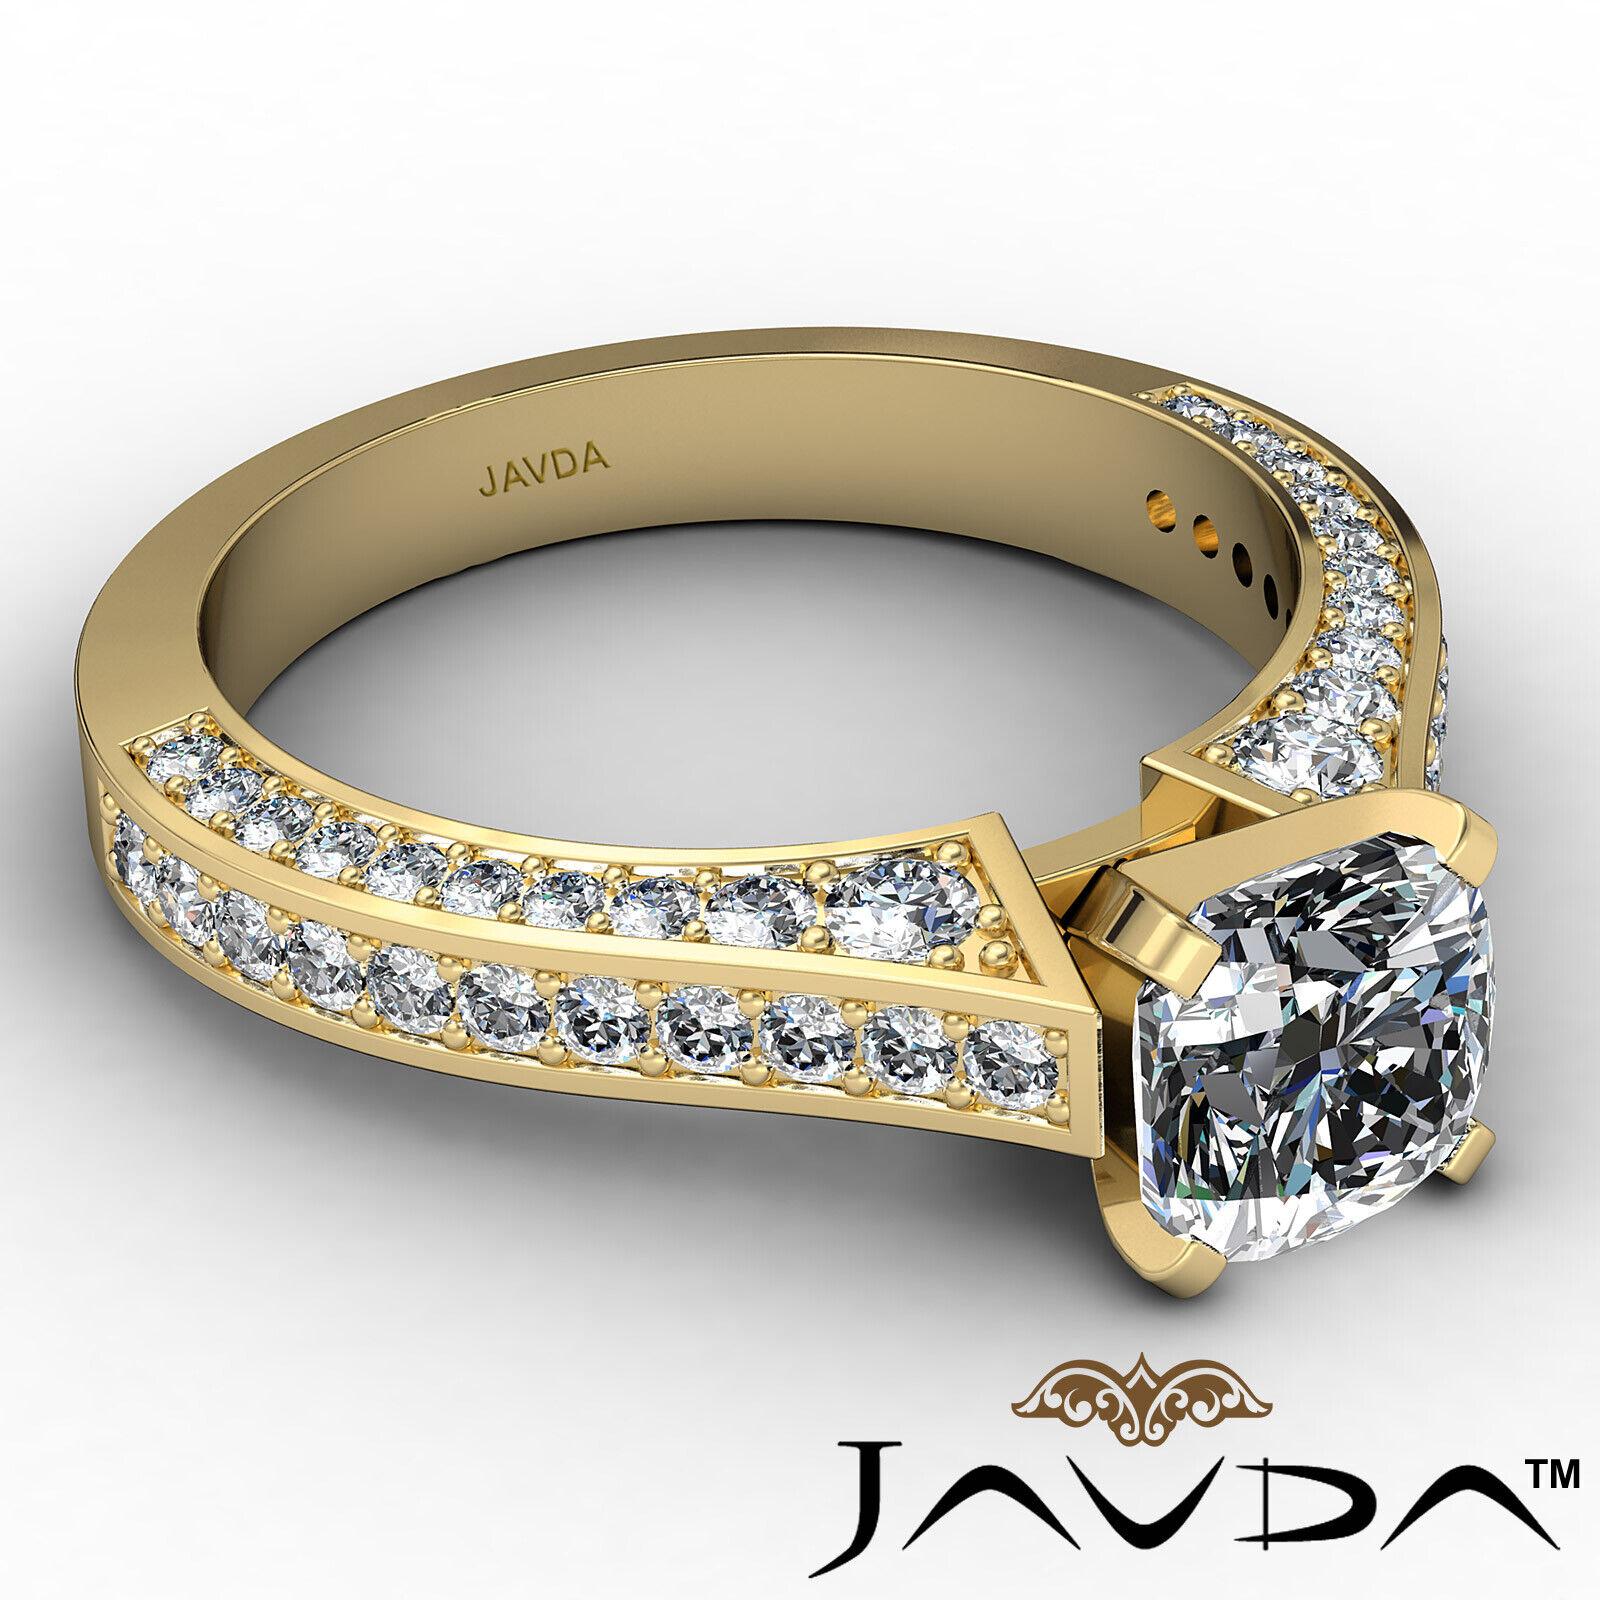 Cushion Diamond Engagement Pave Set Ring GIA J Color & VS2 clarity 1.82ctw 7